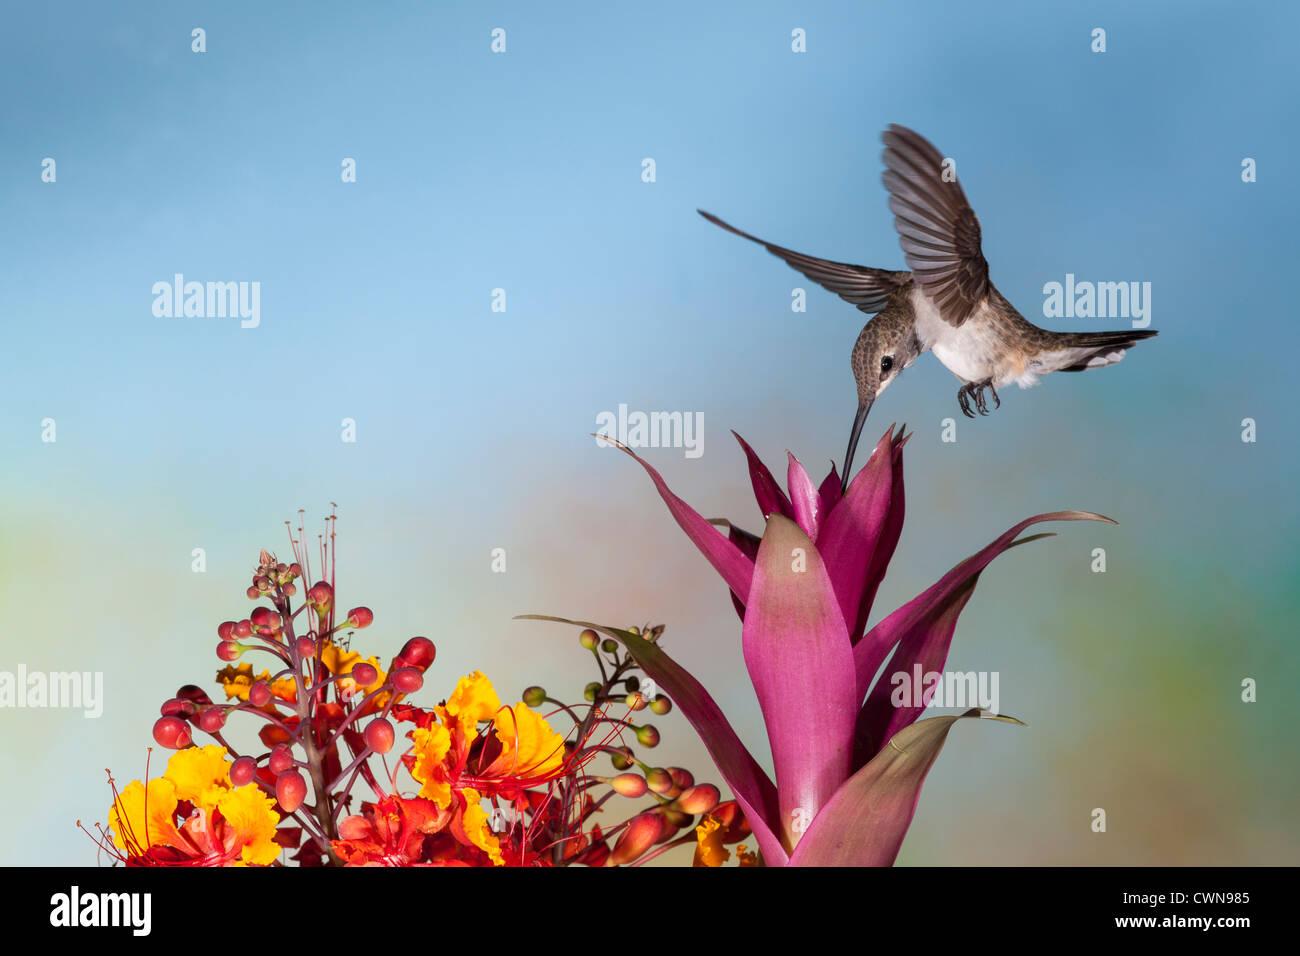 Black-chinned Hummingbird, Archilochus alexandri, feeding on nectar flowers. - Stock Image